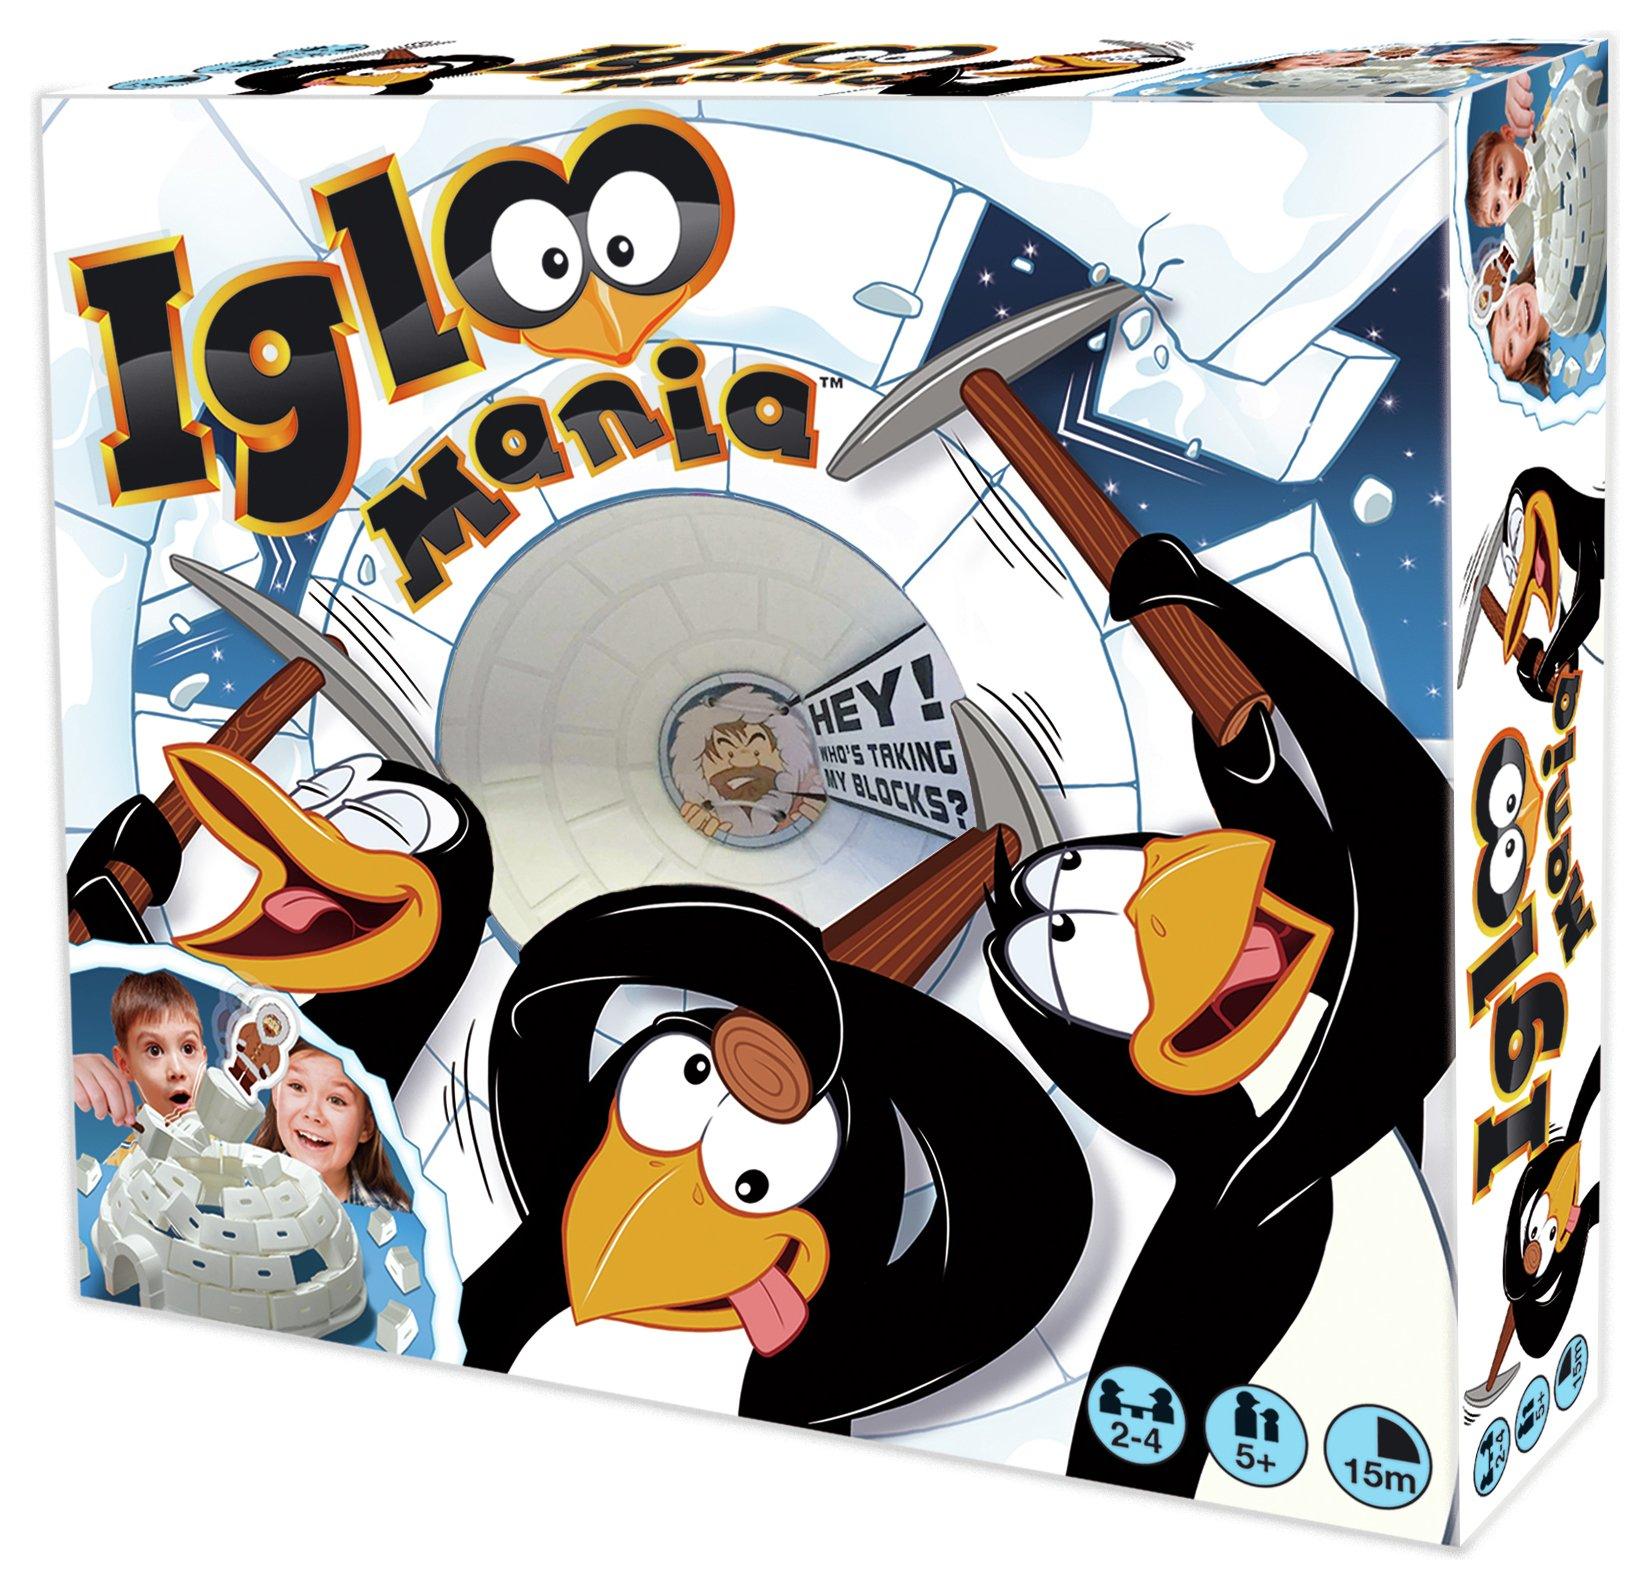 Image of Brainstorm Igloo Mania Game.